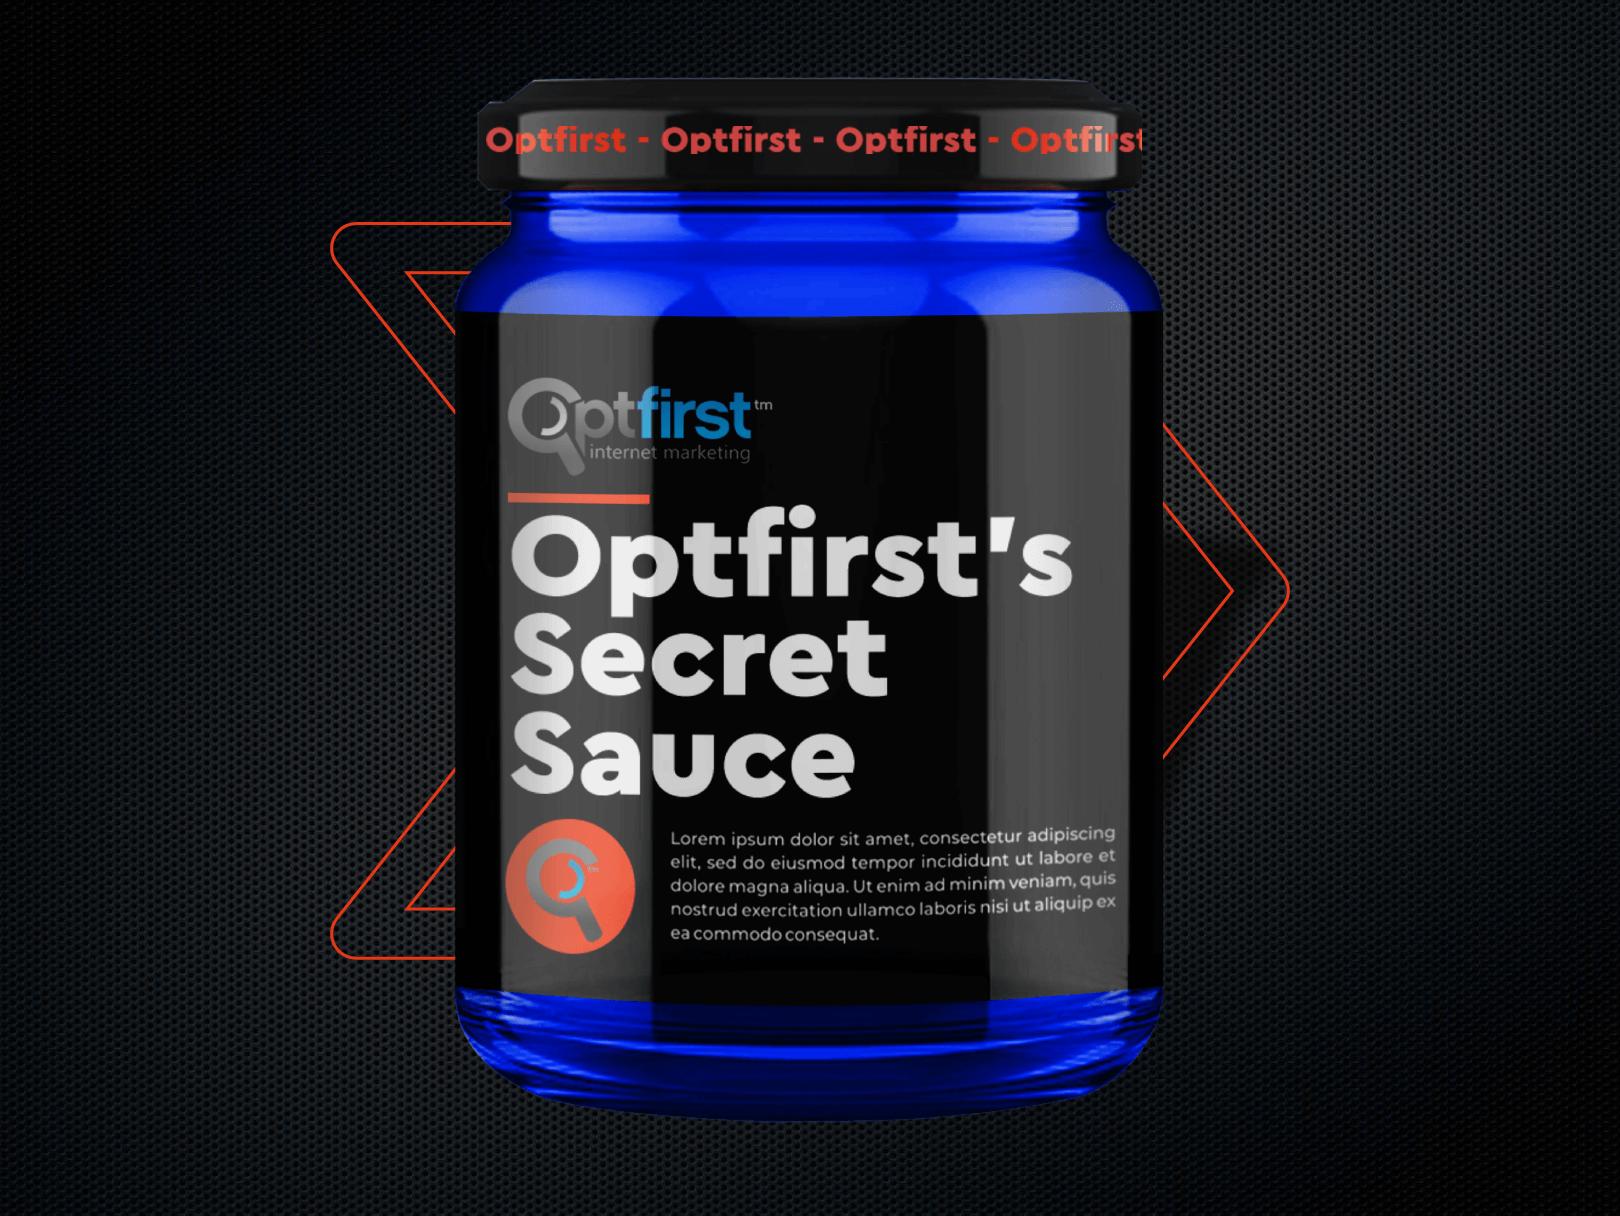 OptFirst's Secret Sauce